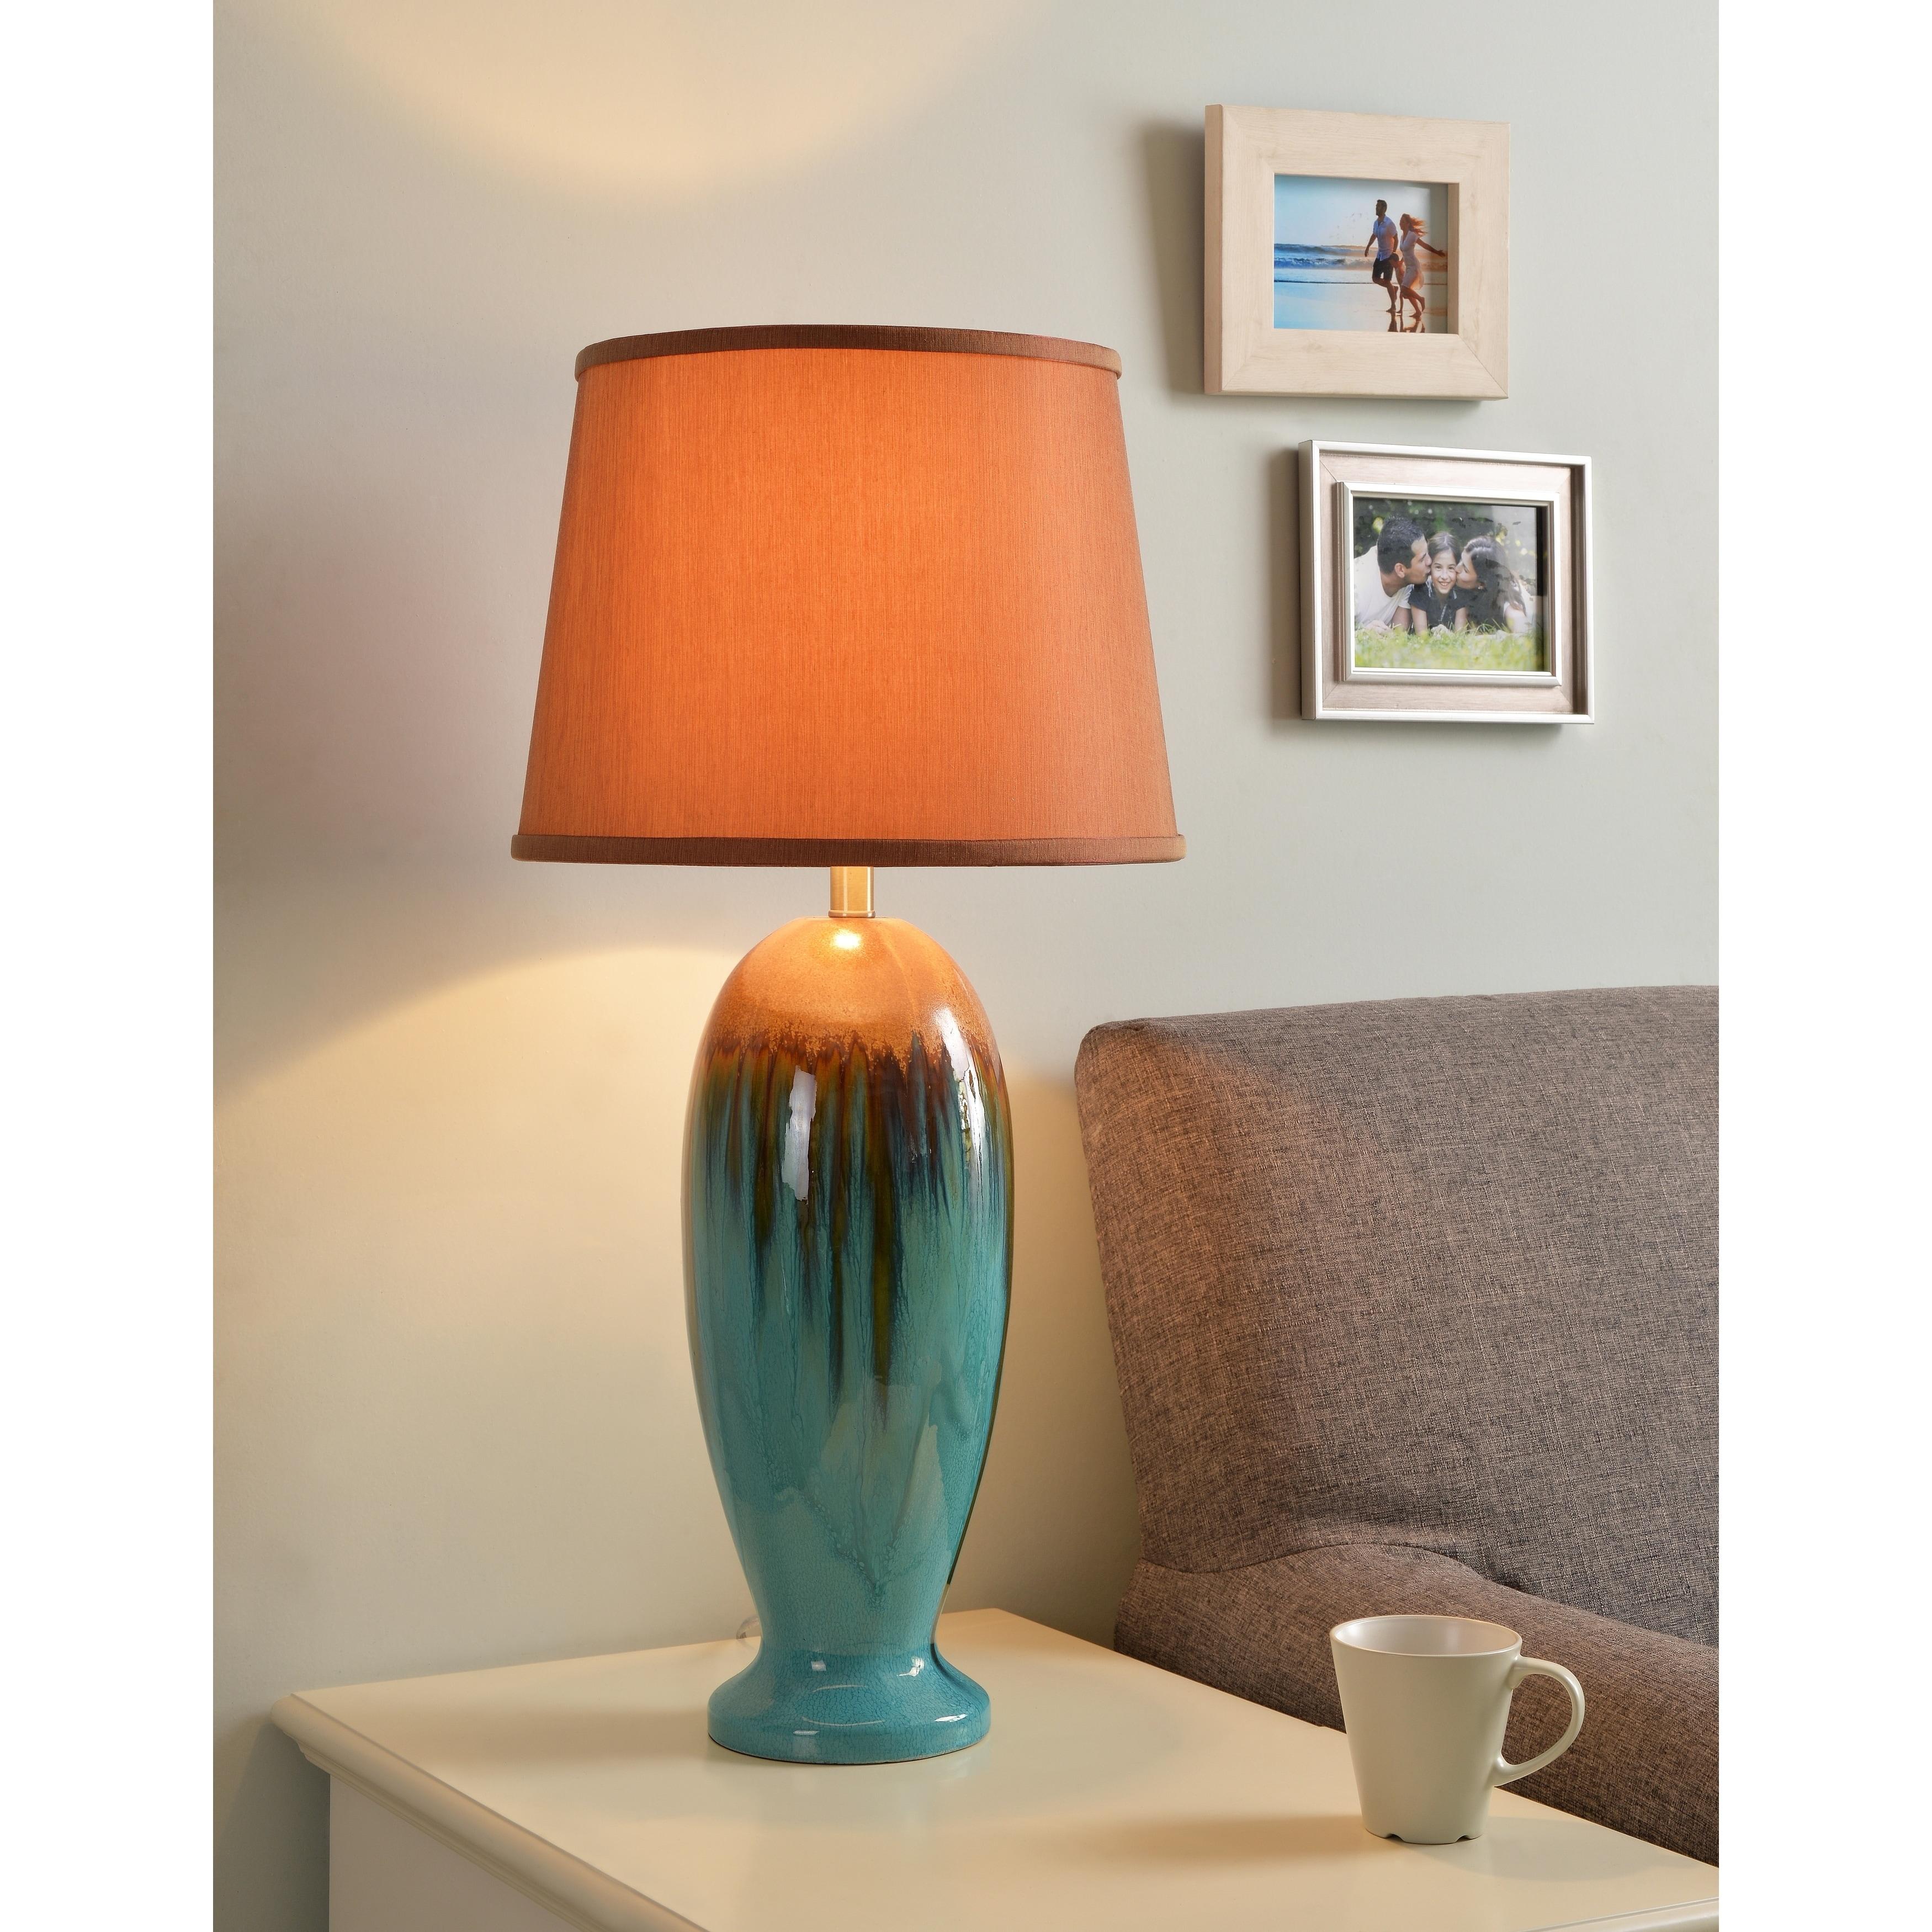 Shop Bellmore Teal Ceramic Glaze 30 Inch Table Lamp On Sale Free